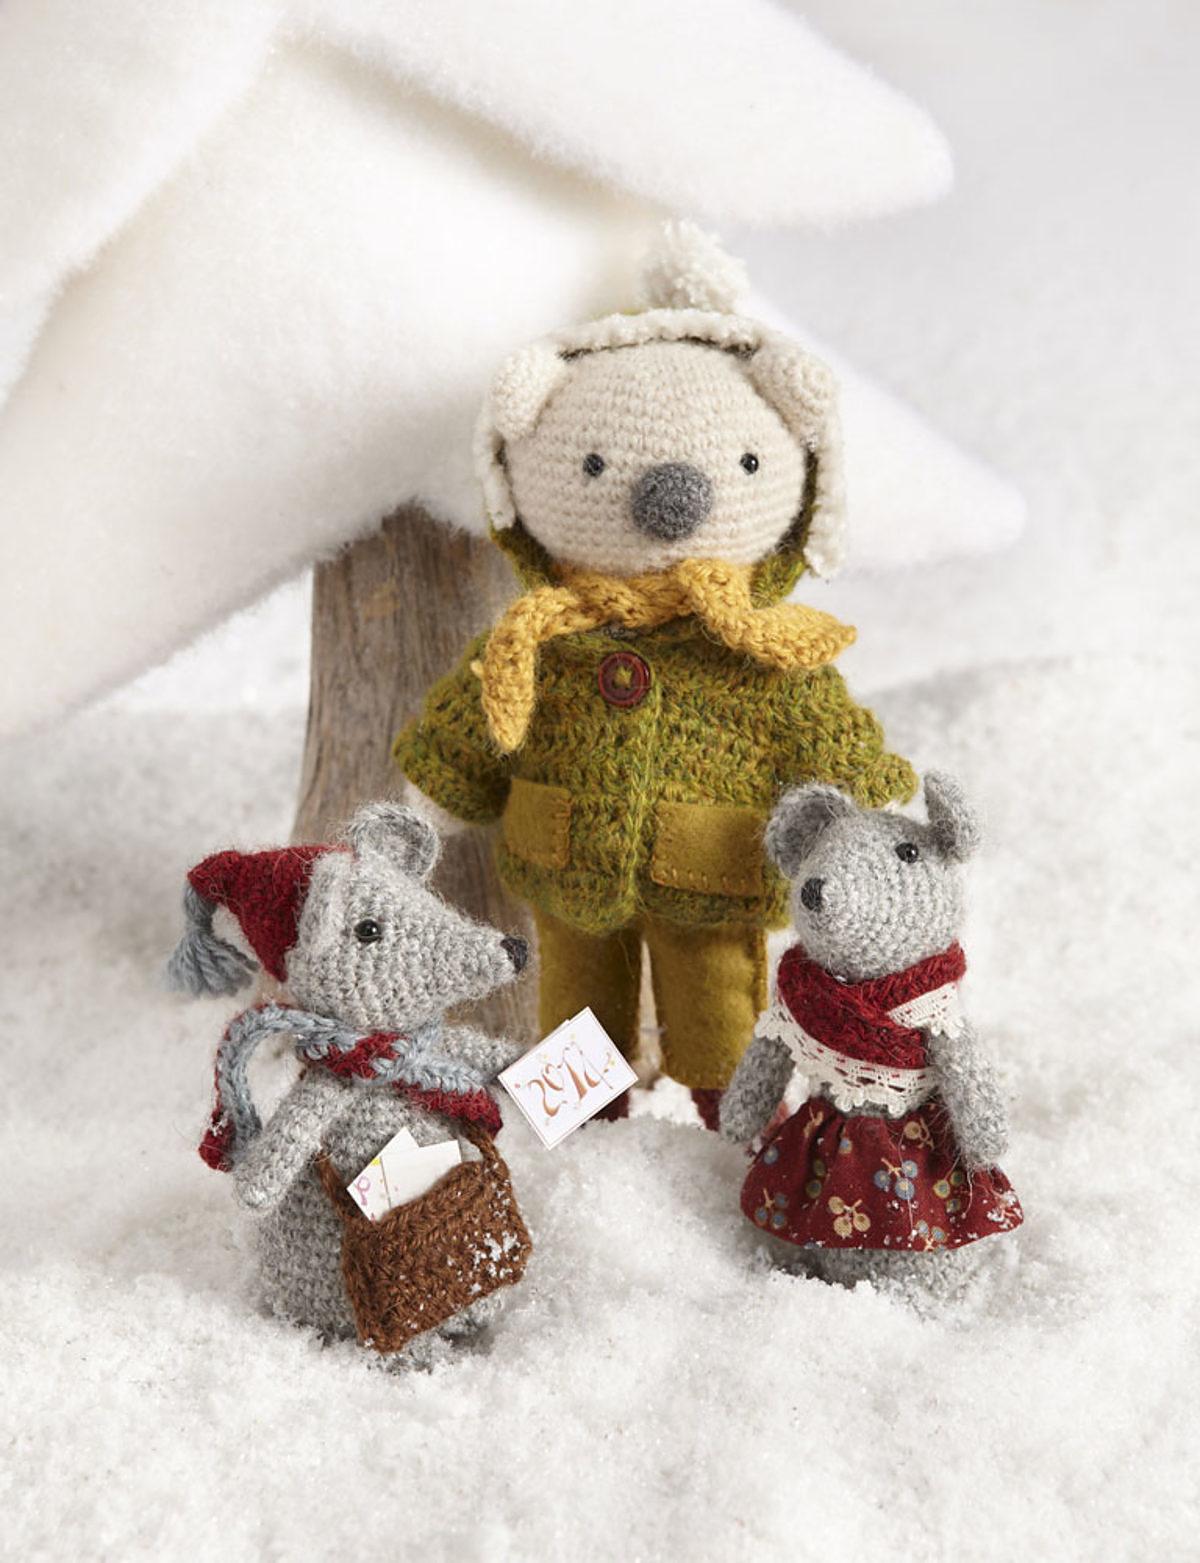 Amigurumis-hiver-crochet-edisaxe-5829112-09